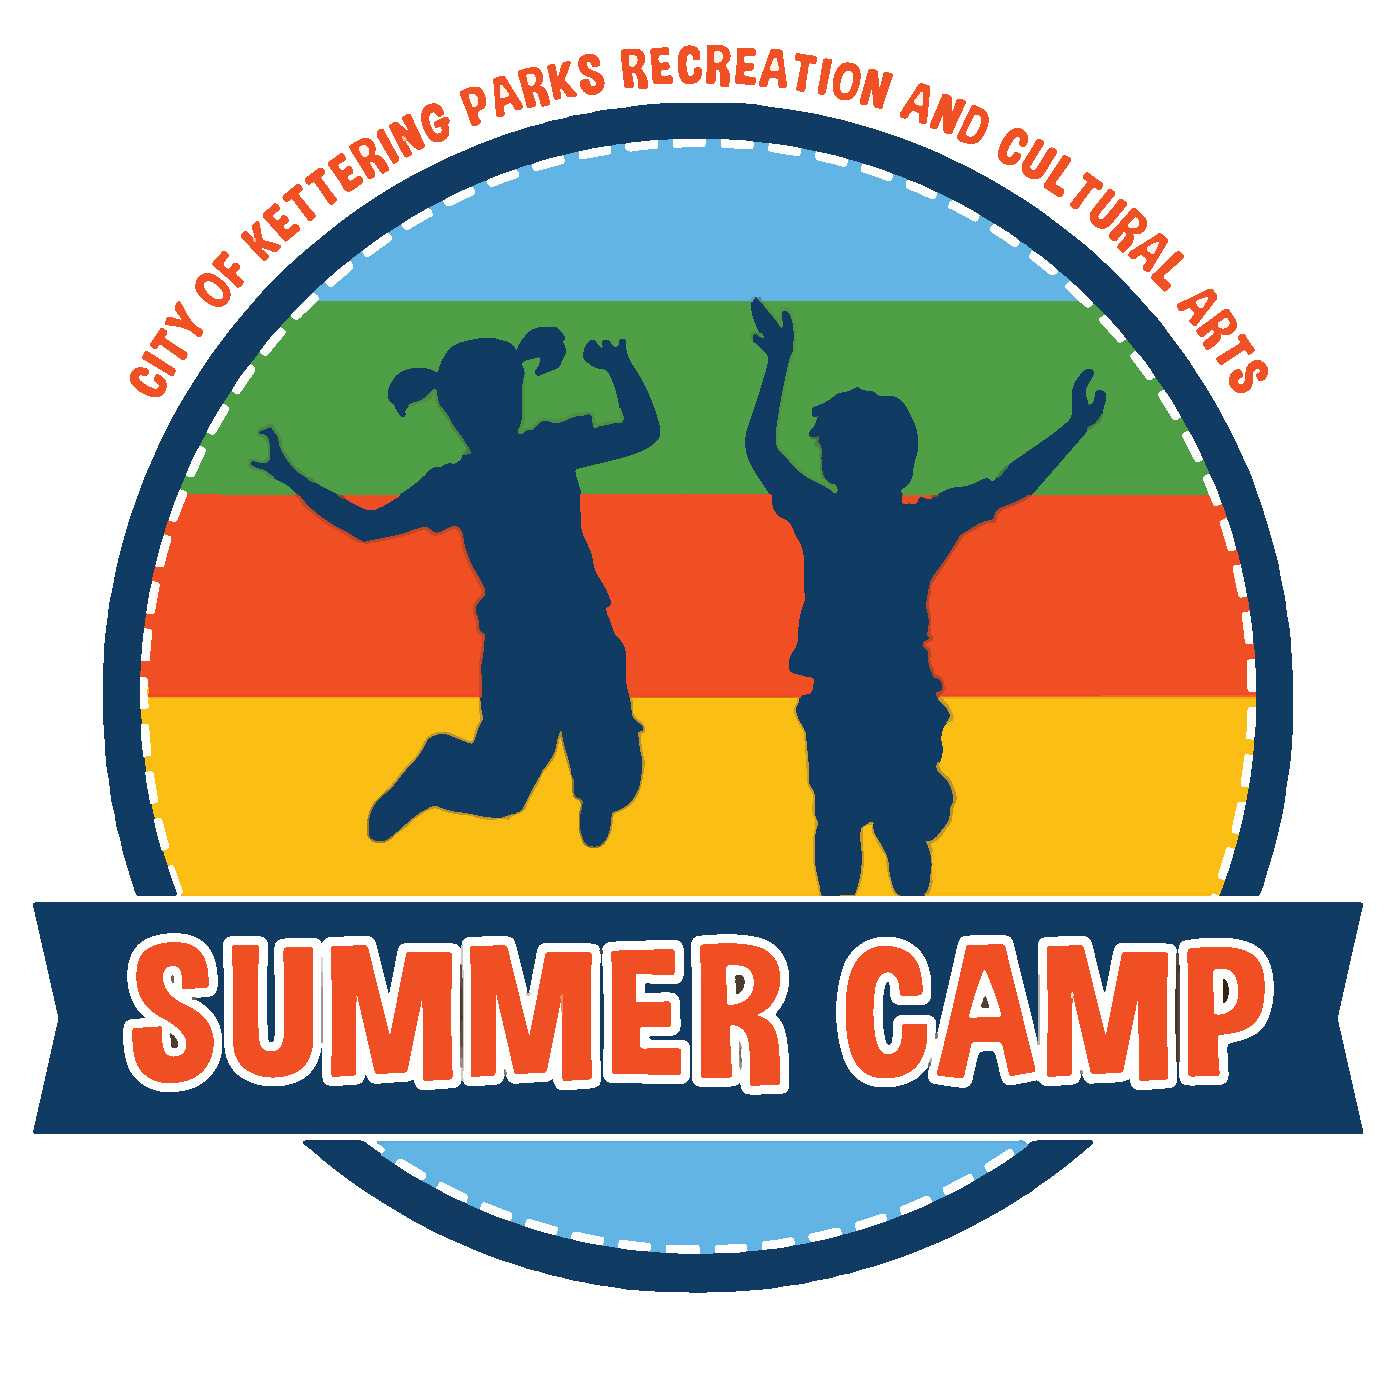 summer camps logo